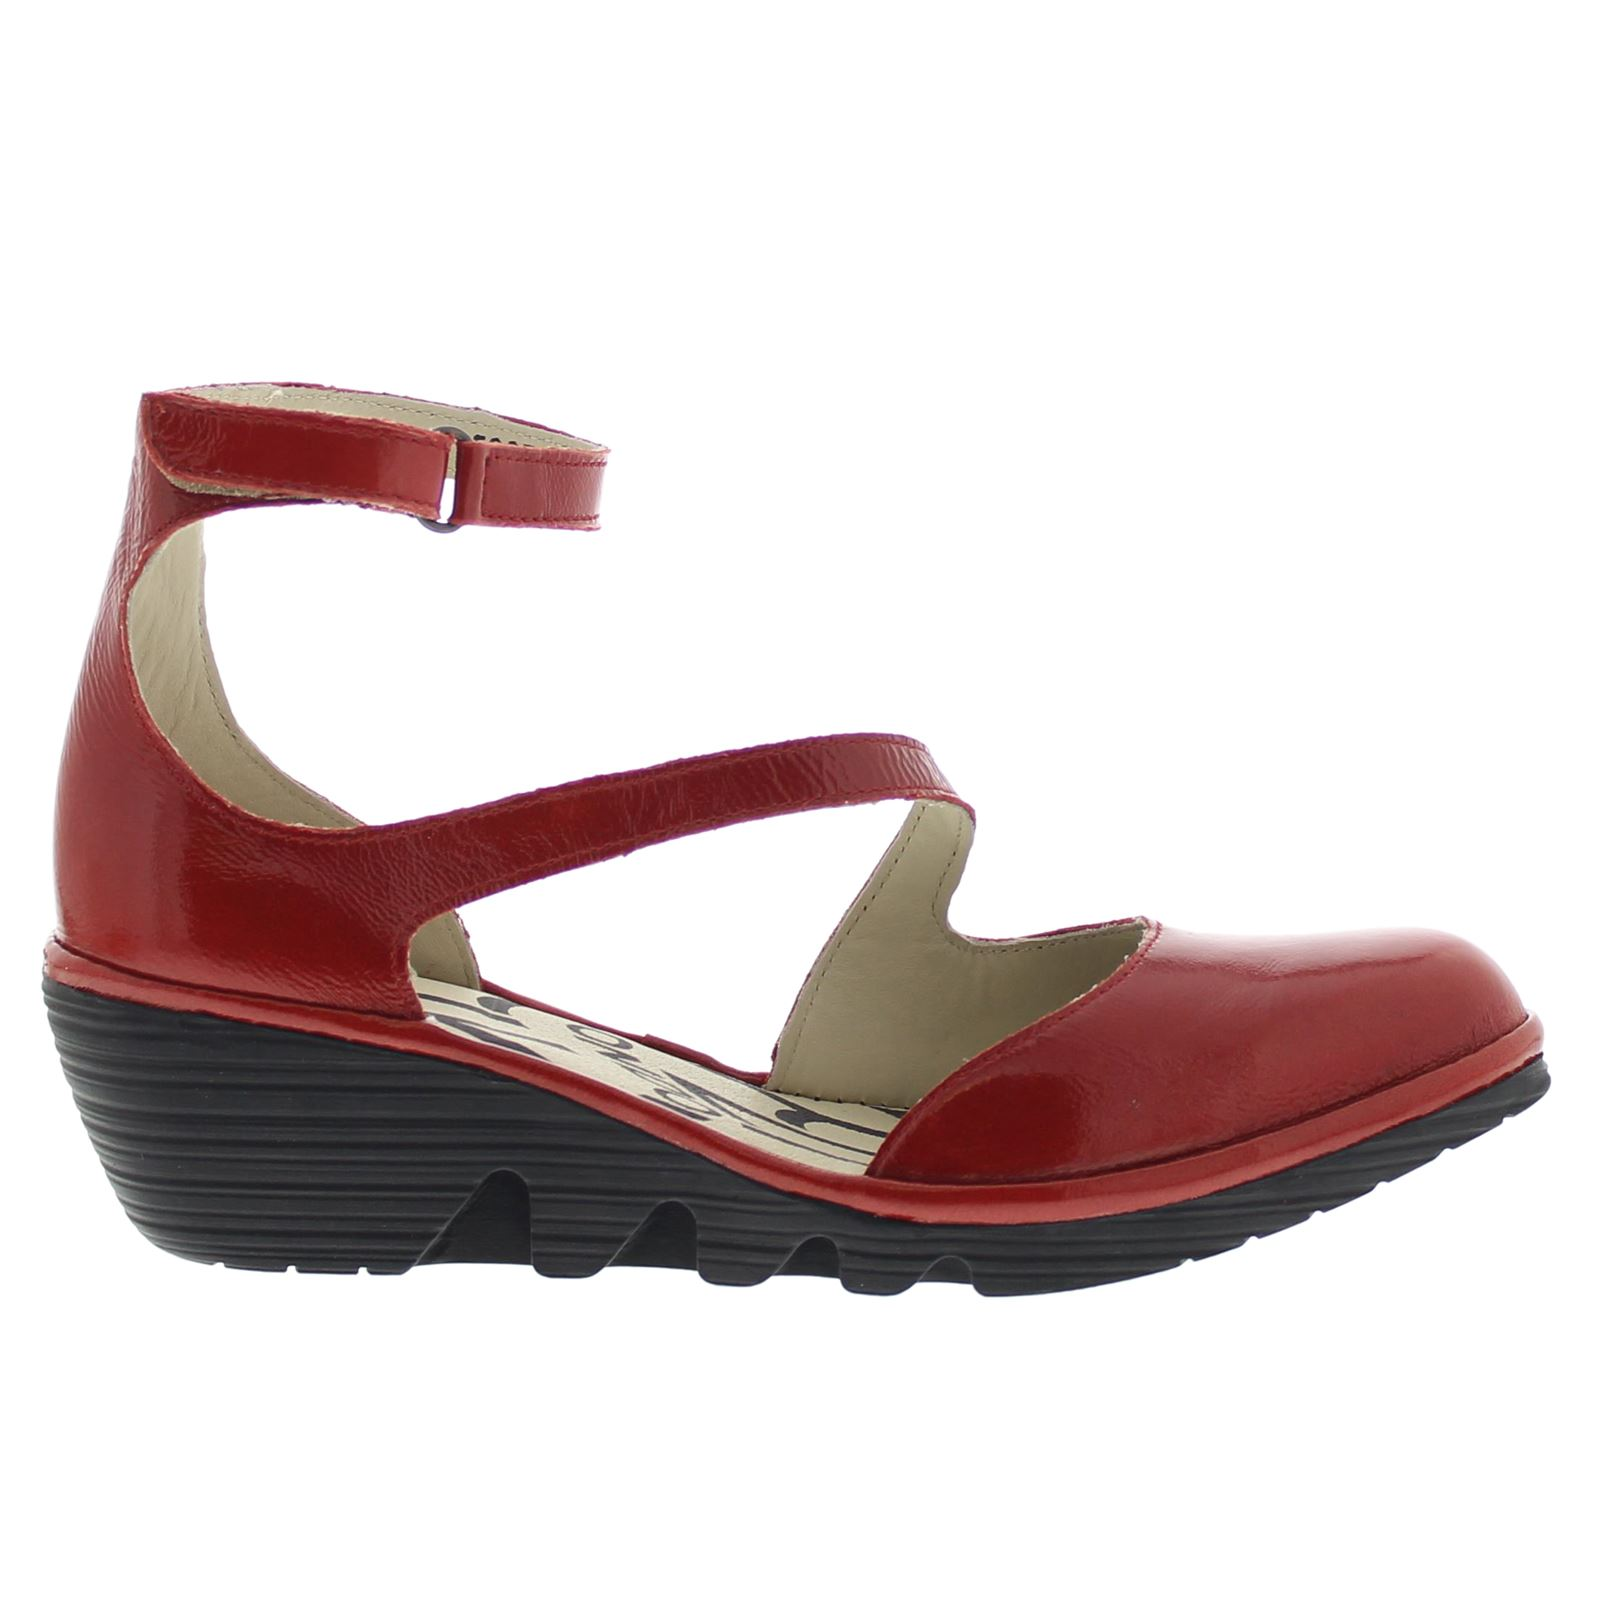 Amazon Shoes Womens Clarks Sandals